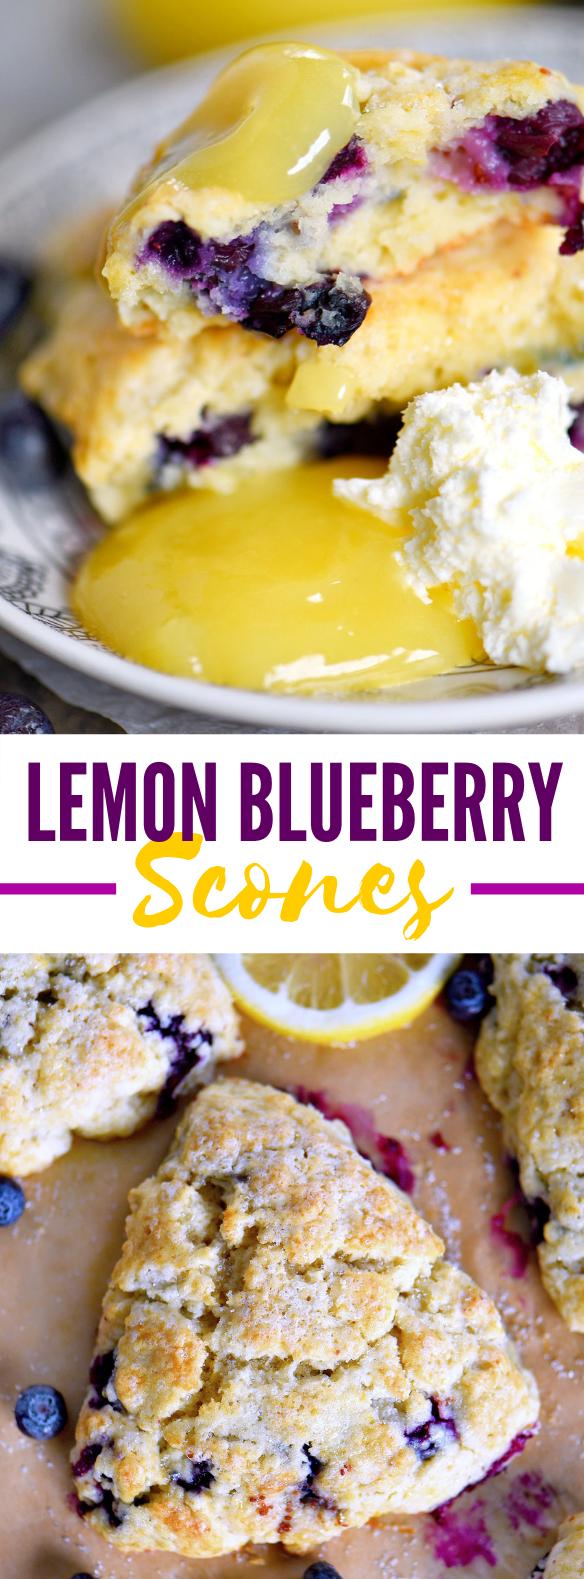 LEMON BLUEBERRY SCONES #desserts #breakfast